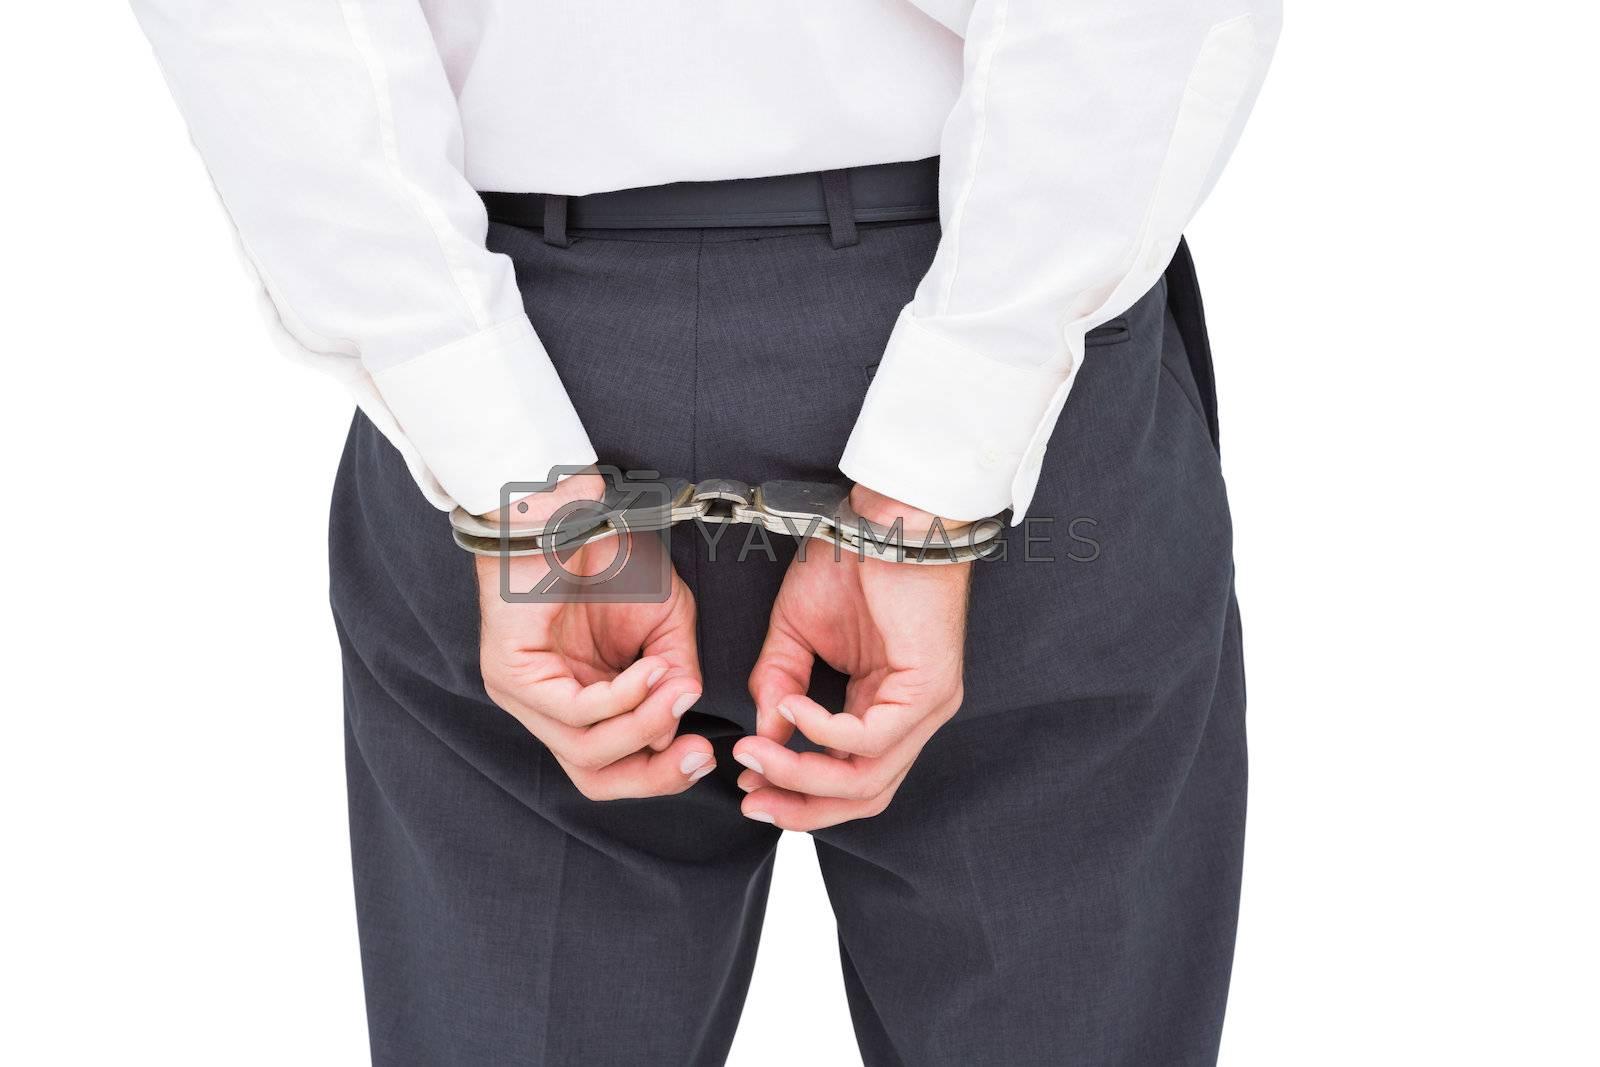 Close up on classy businessman wearing handcuffs by Wavebreakmedia